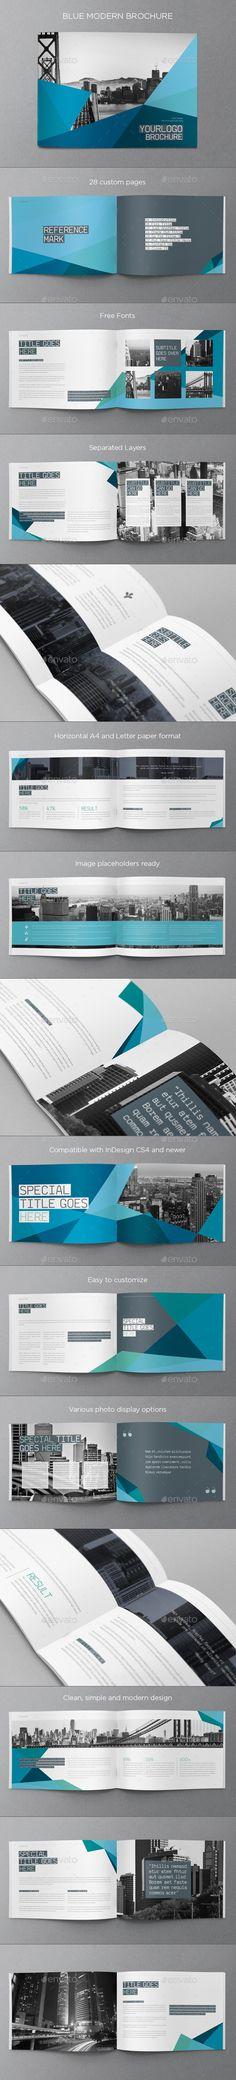 Blue Modern Brochure - Brochures Print Templates